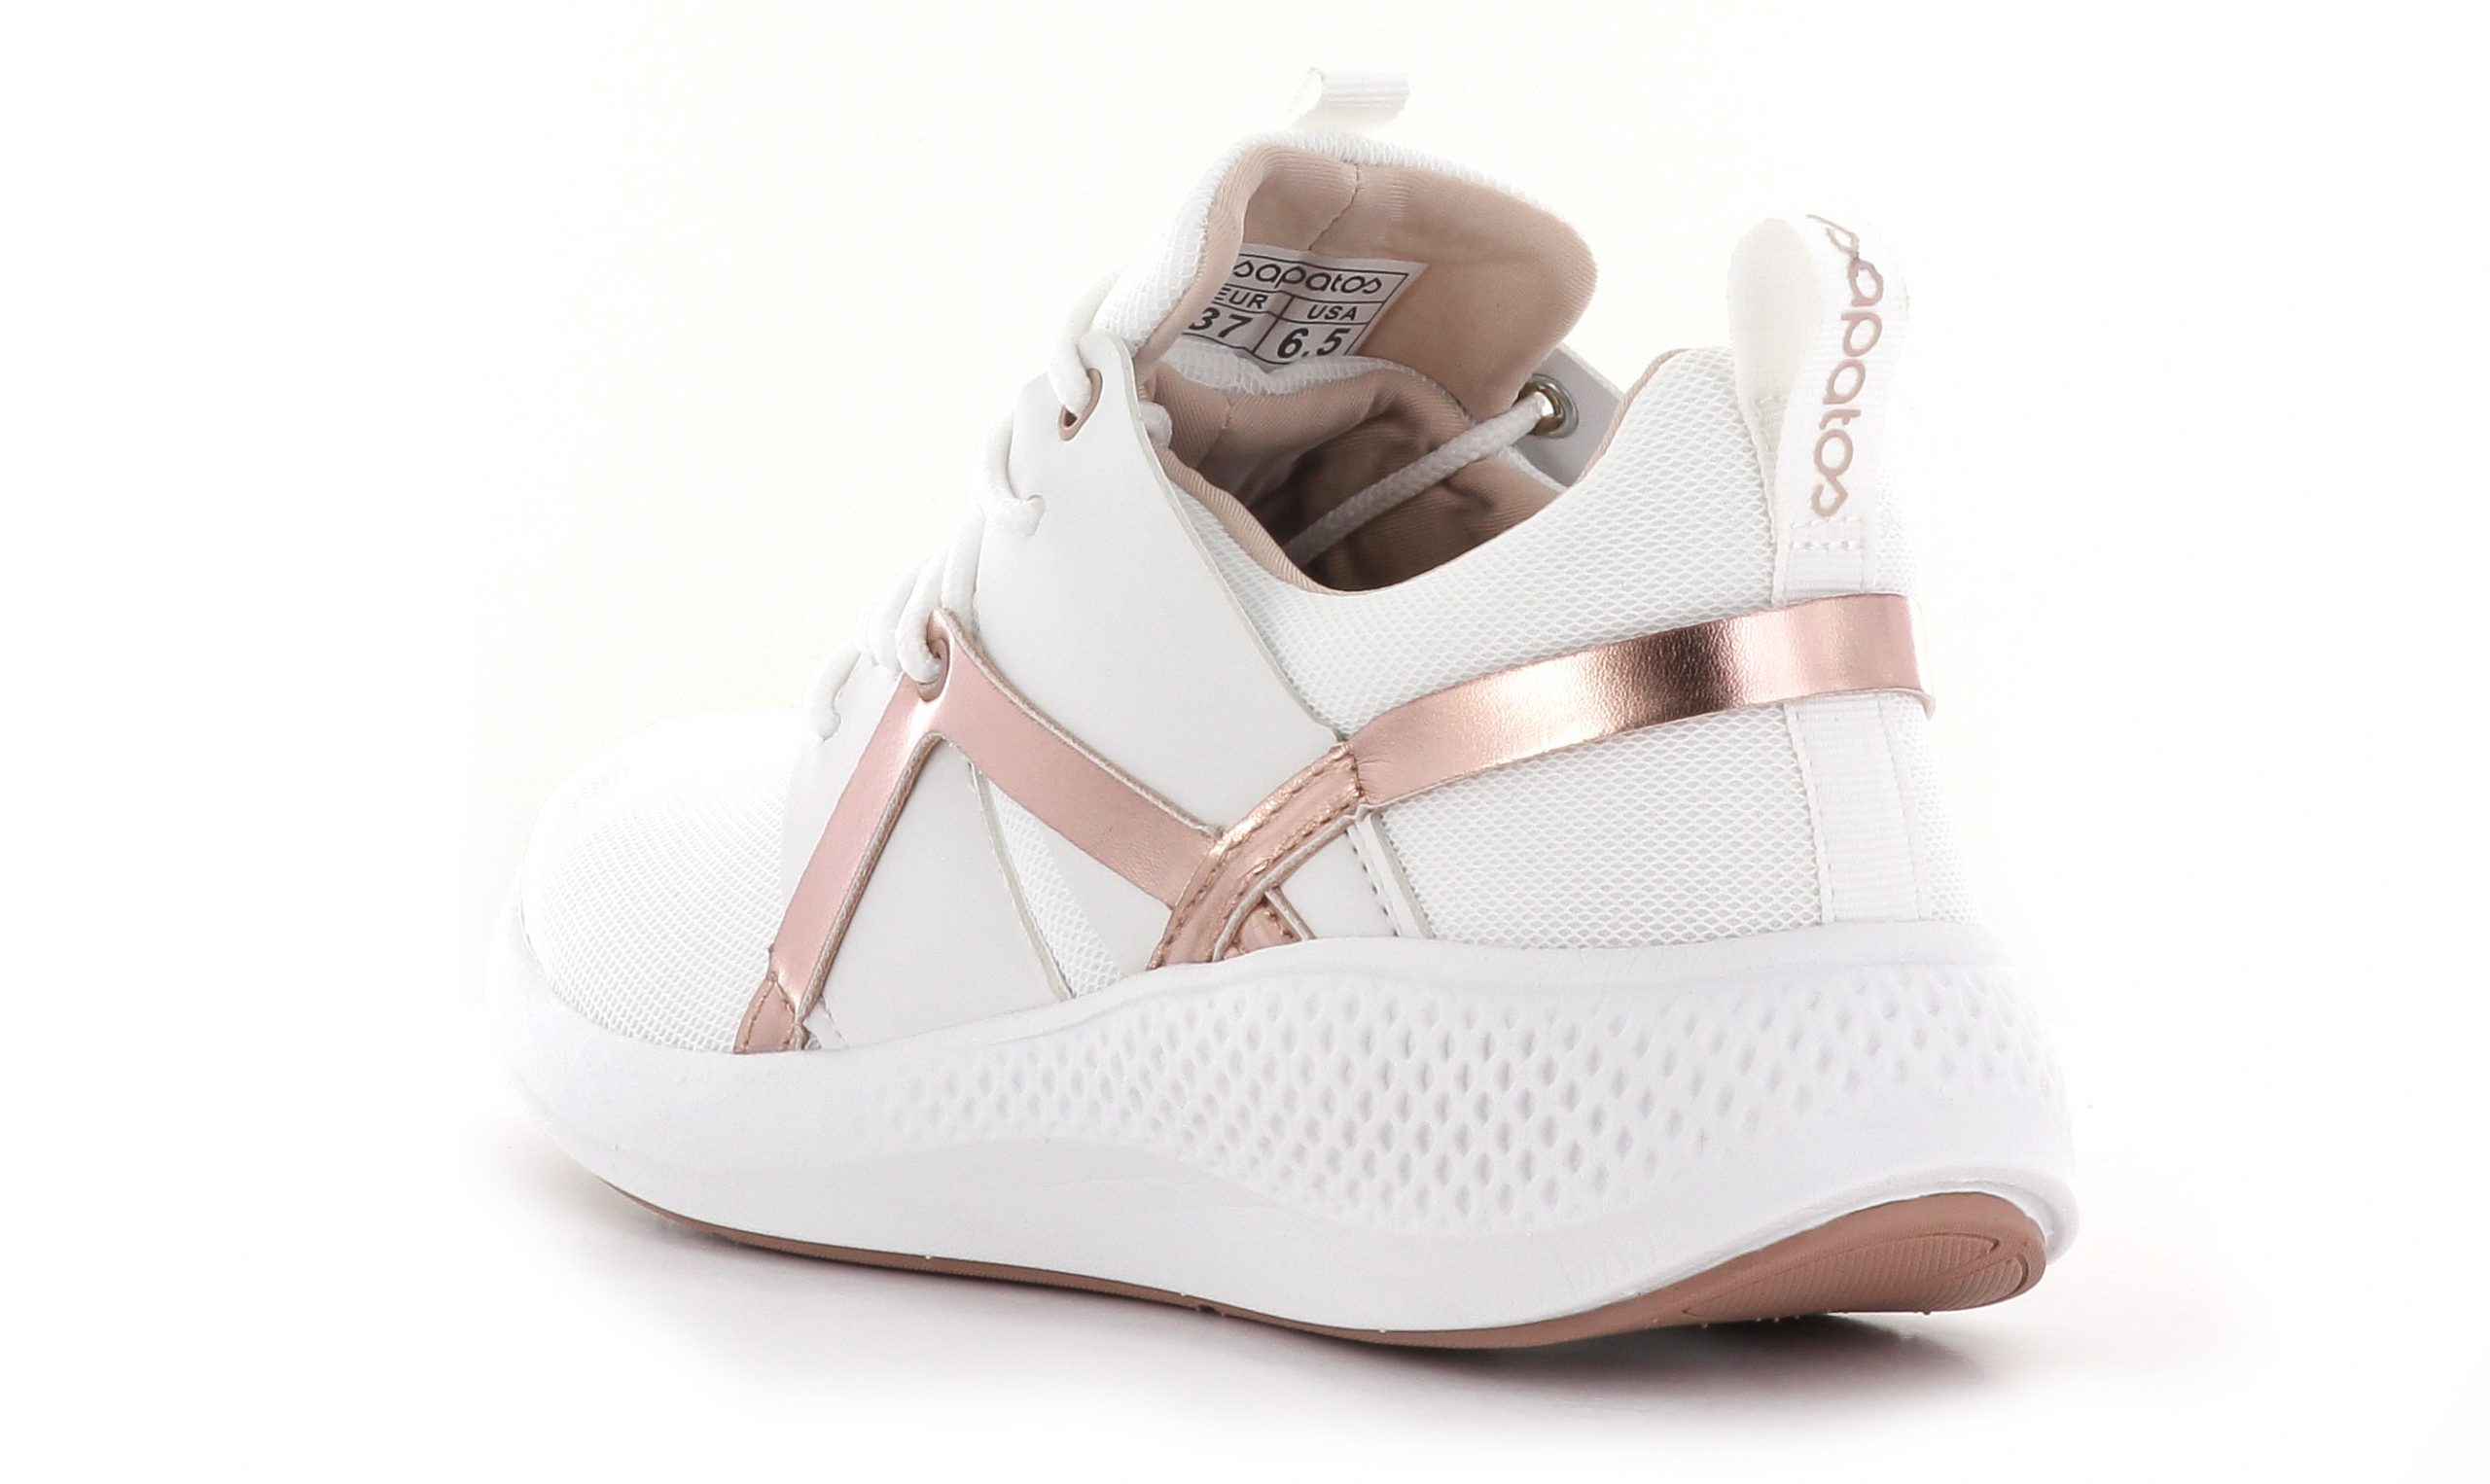 Hvit Sapatos Ys Oslo Sneaker Sko